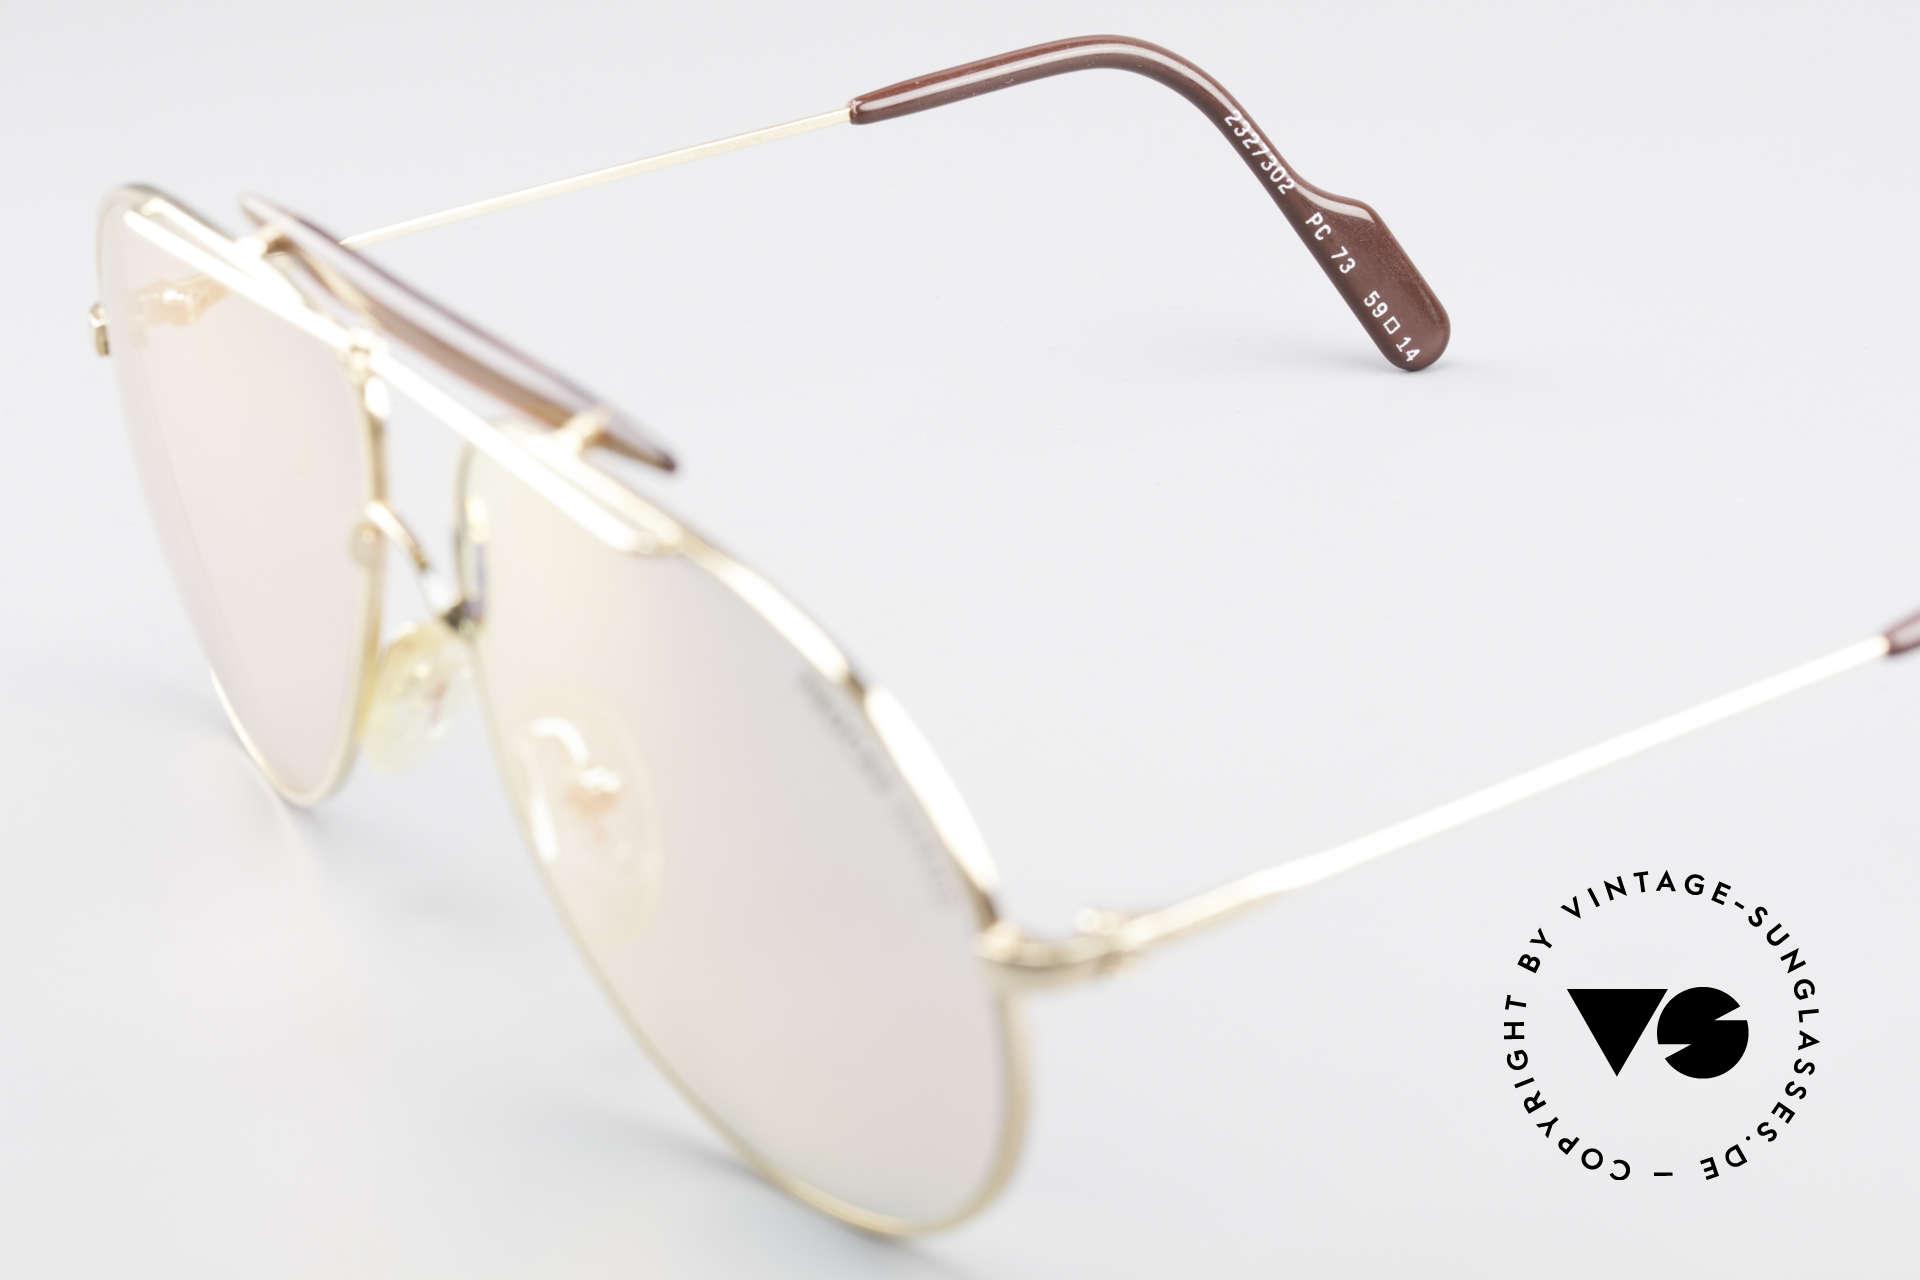 Alpina PC73 ProCar Serie Sunglasses Men, NO RETRO sunglasses, but a 25 years old vintage original, Made for Men and Women